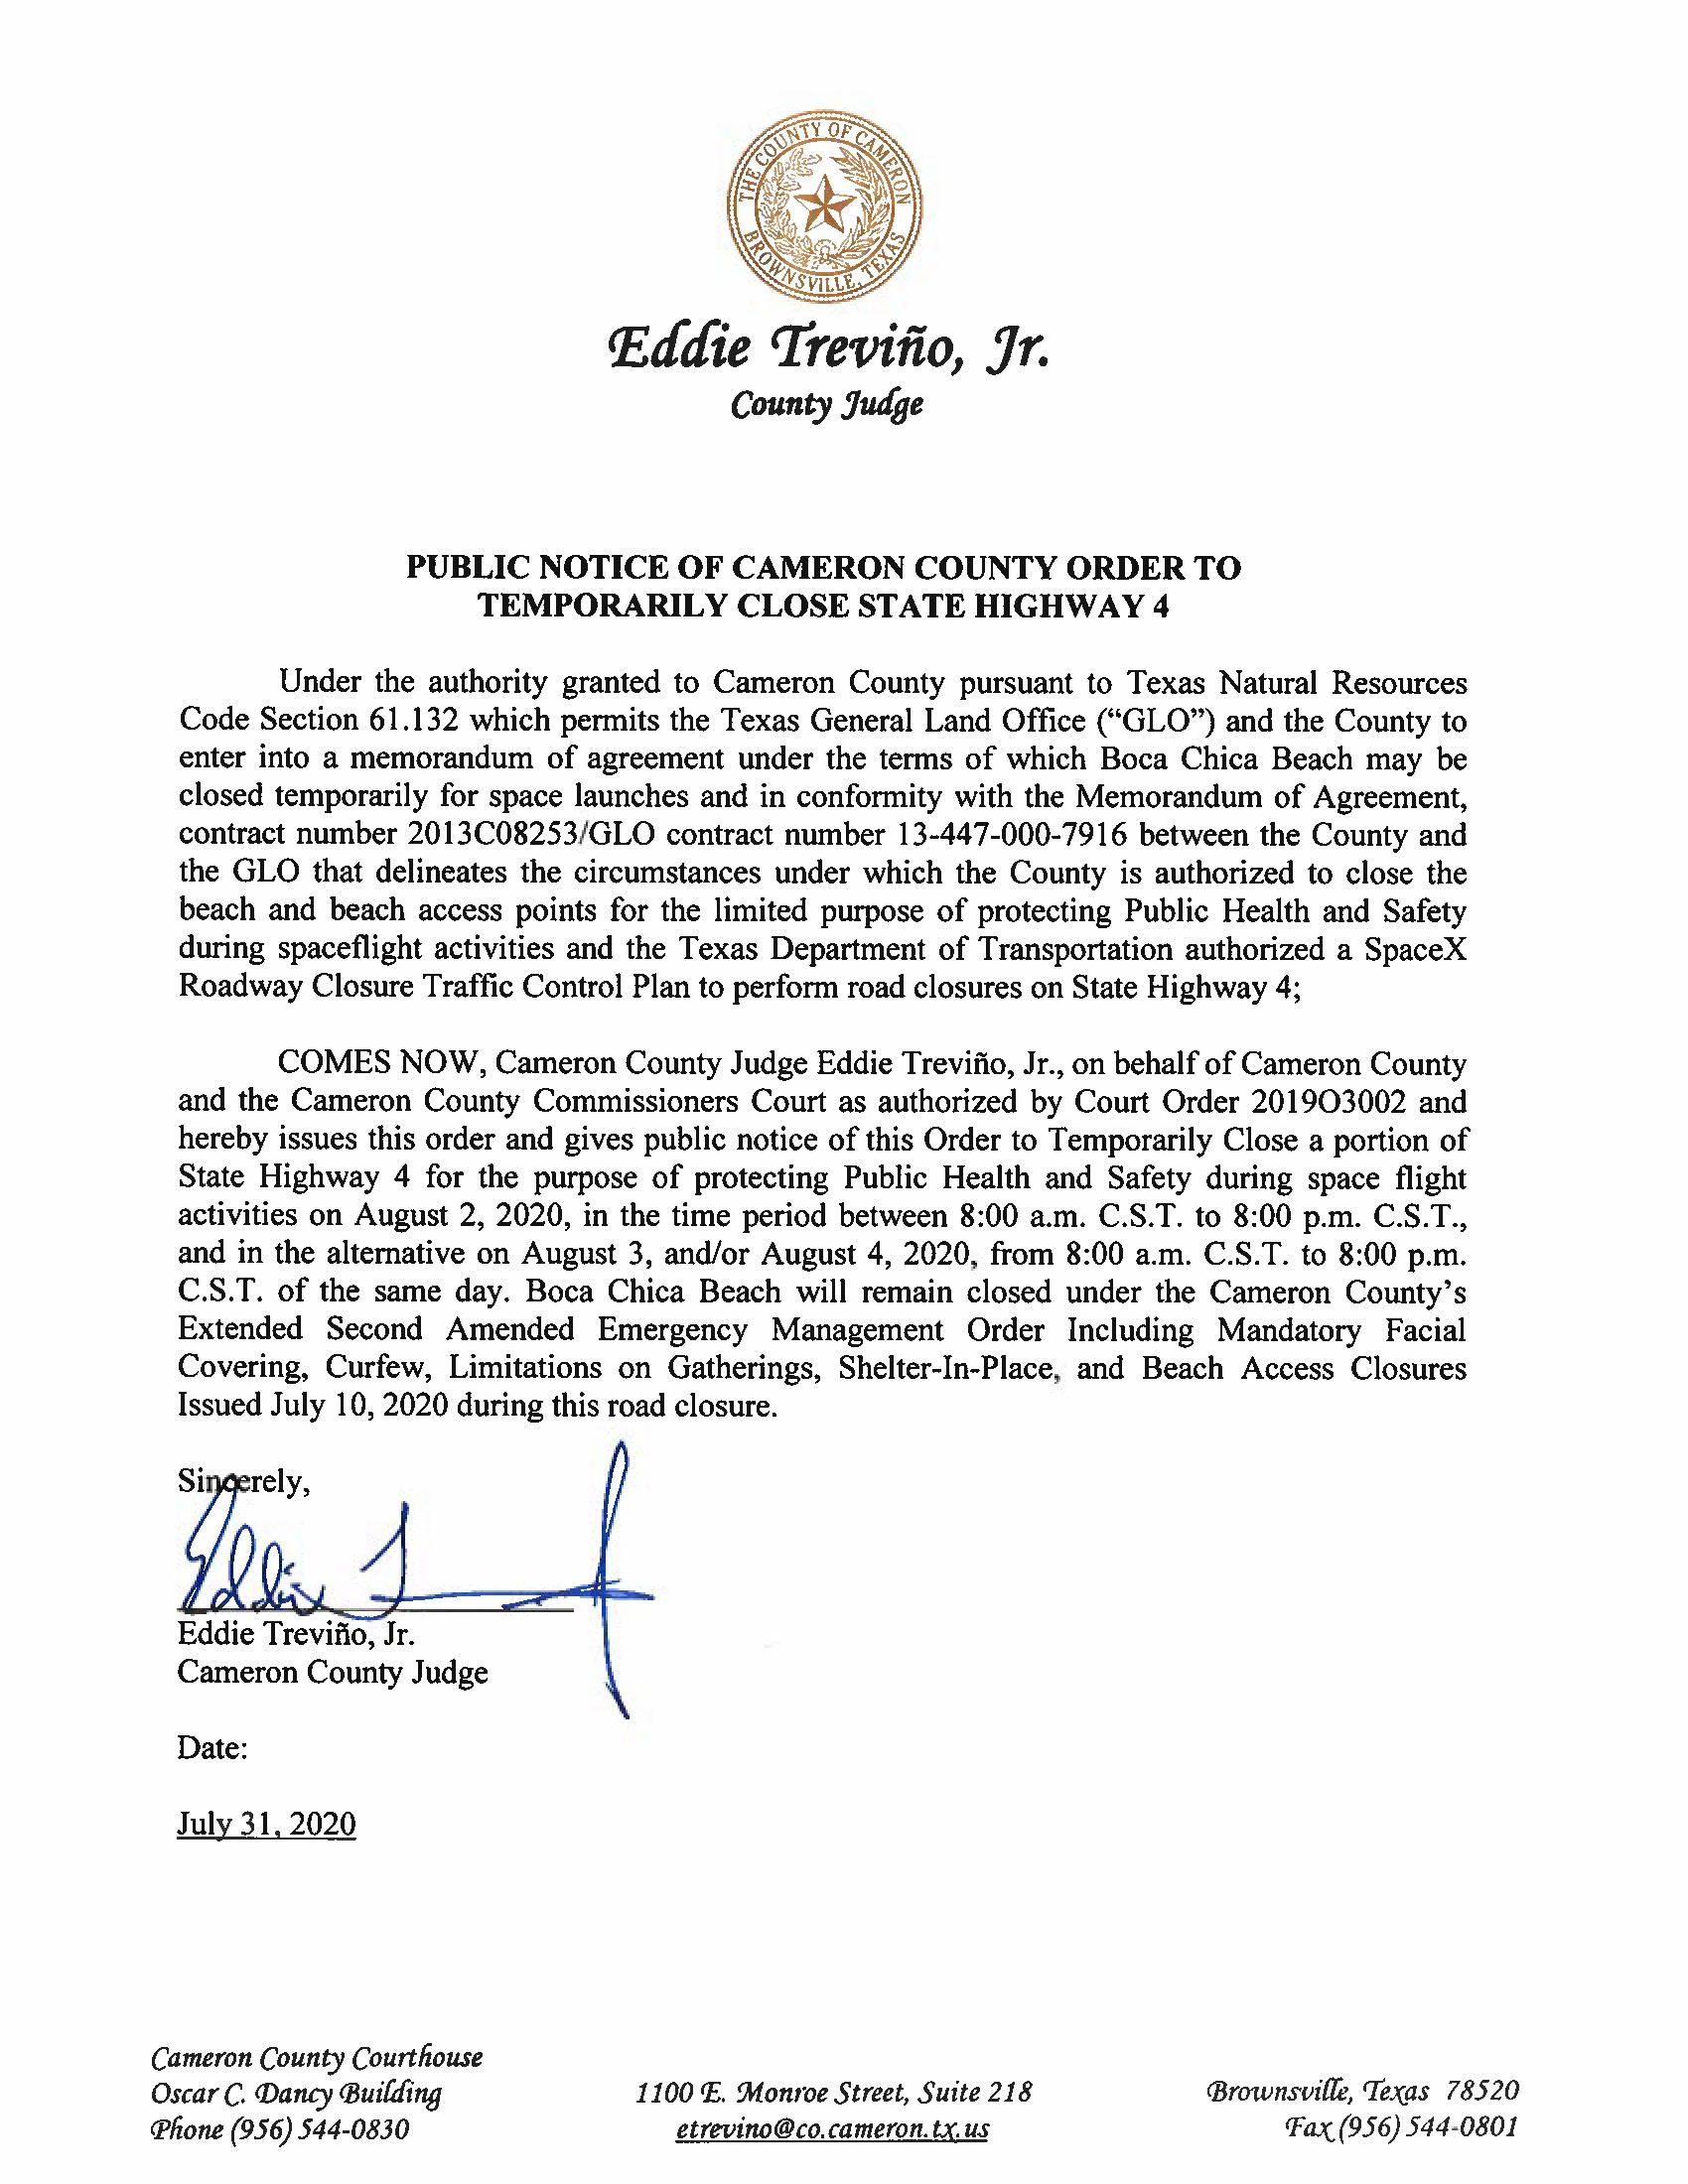 PUBLIC NOTICE OF CAMERON COUNTY ORDER TO TEMP. ROAD CLOSURE. 08.02.20 Page 1